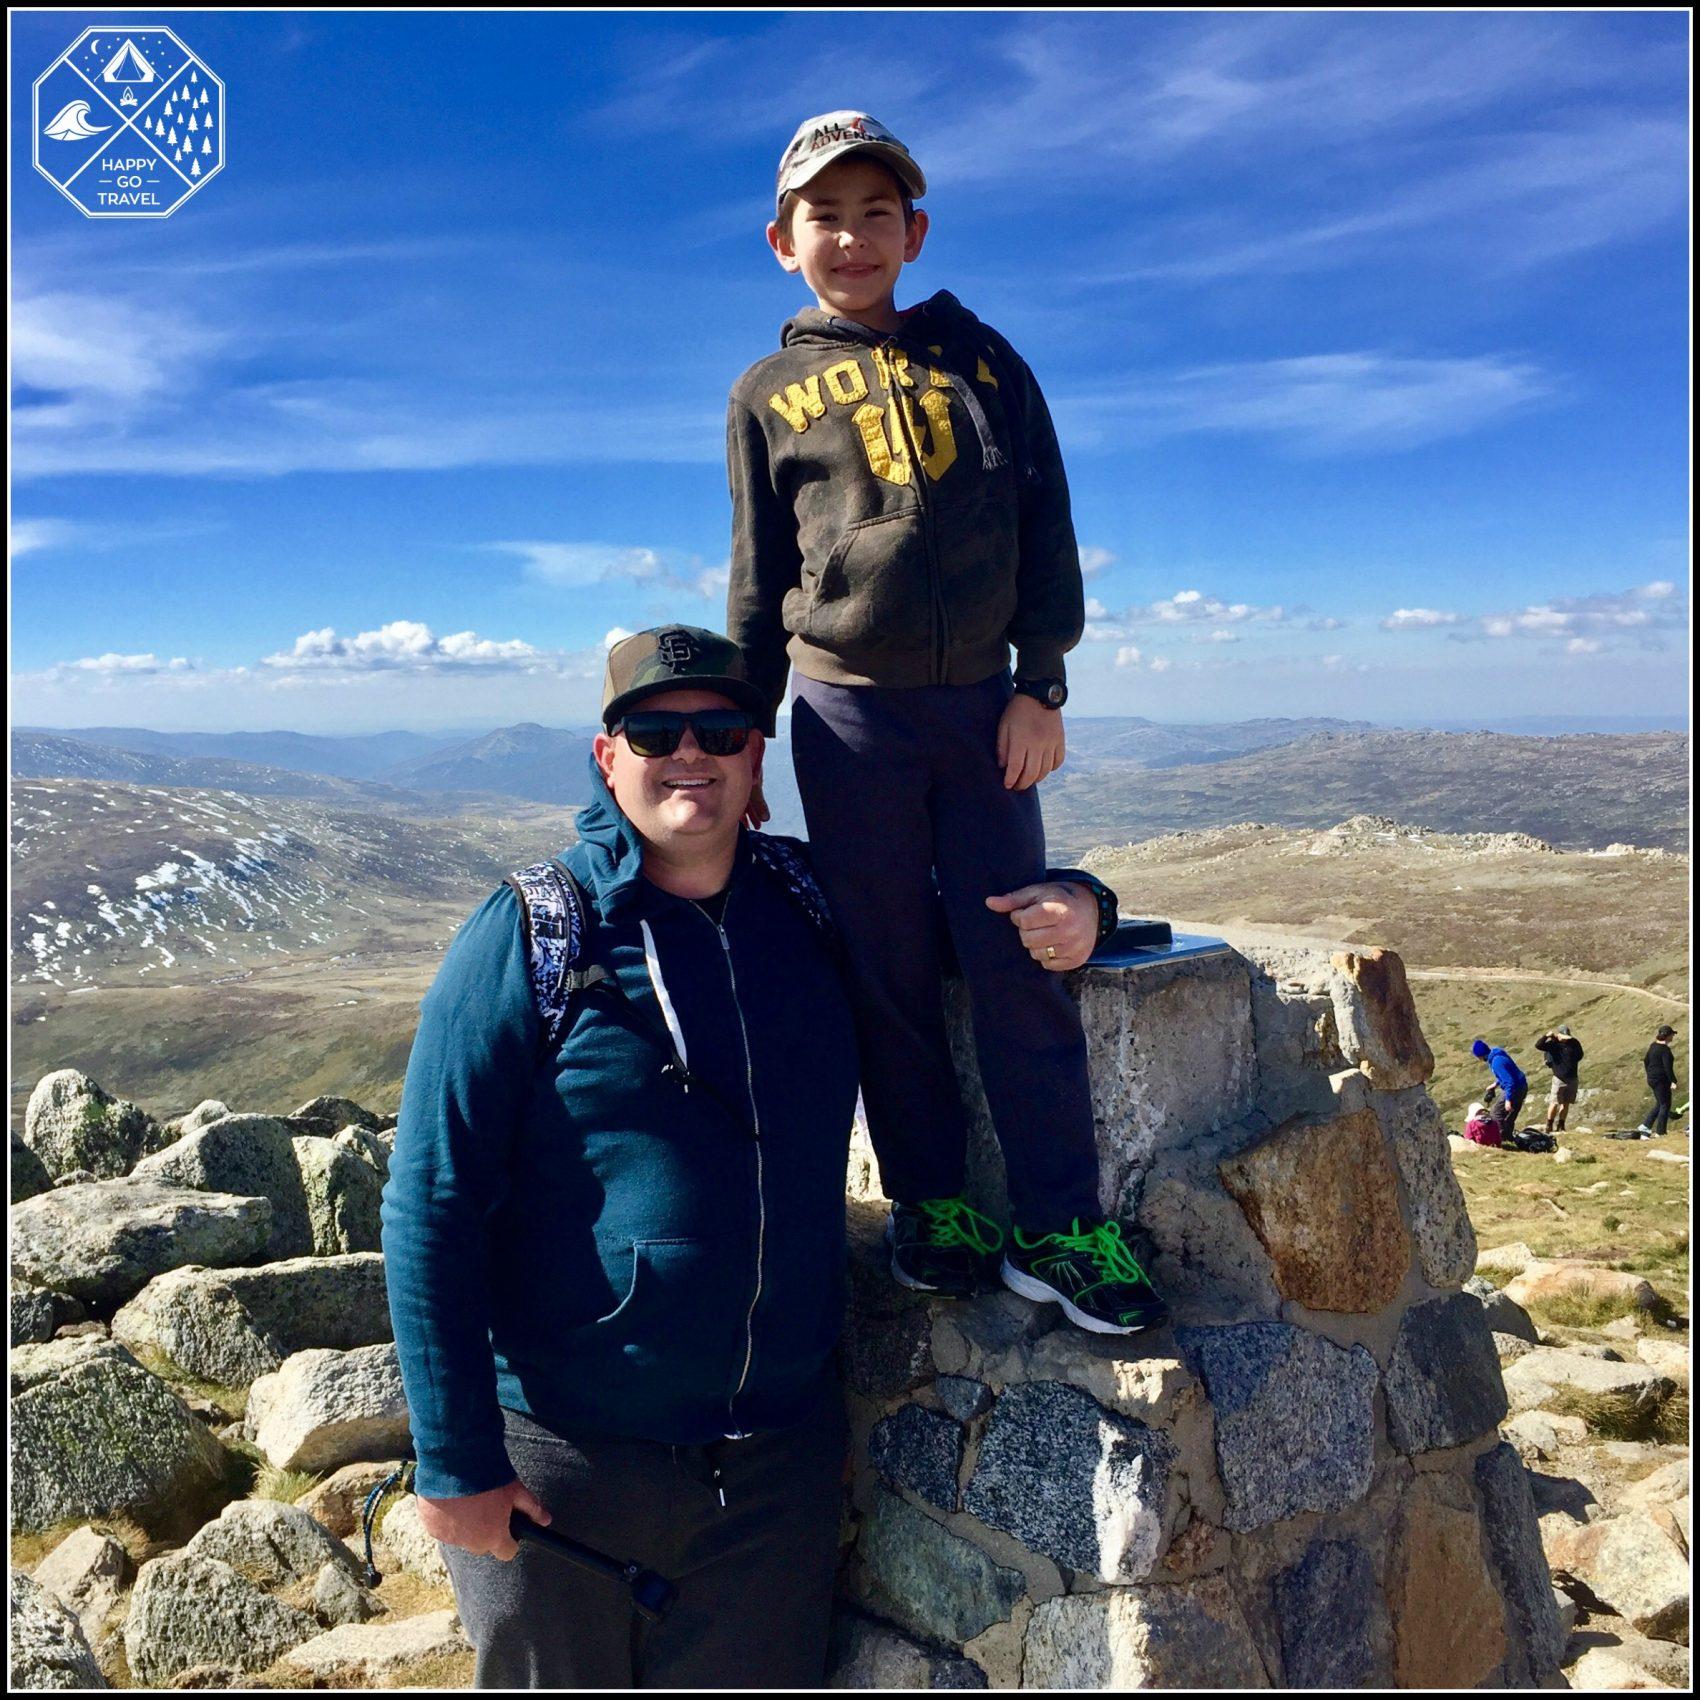 Happy Go Travel Caleb Dec at the sumit of Mt Kosciuszko